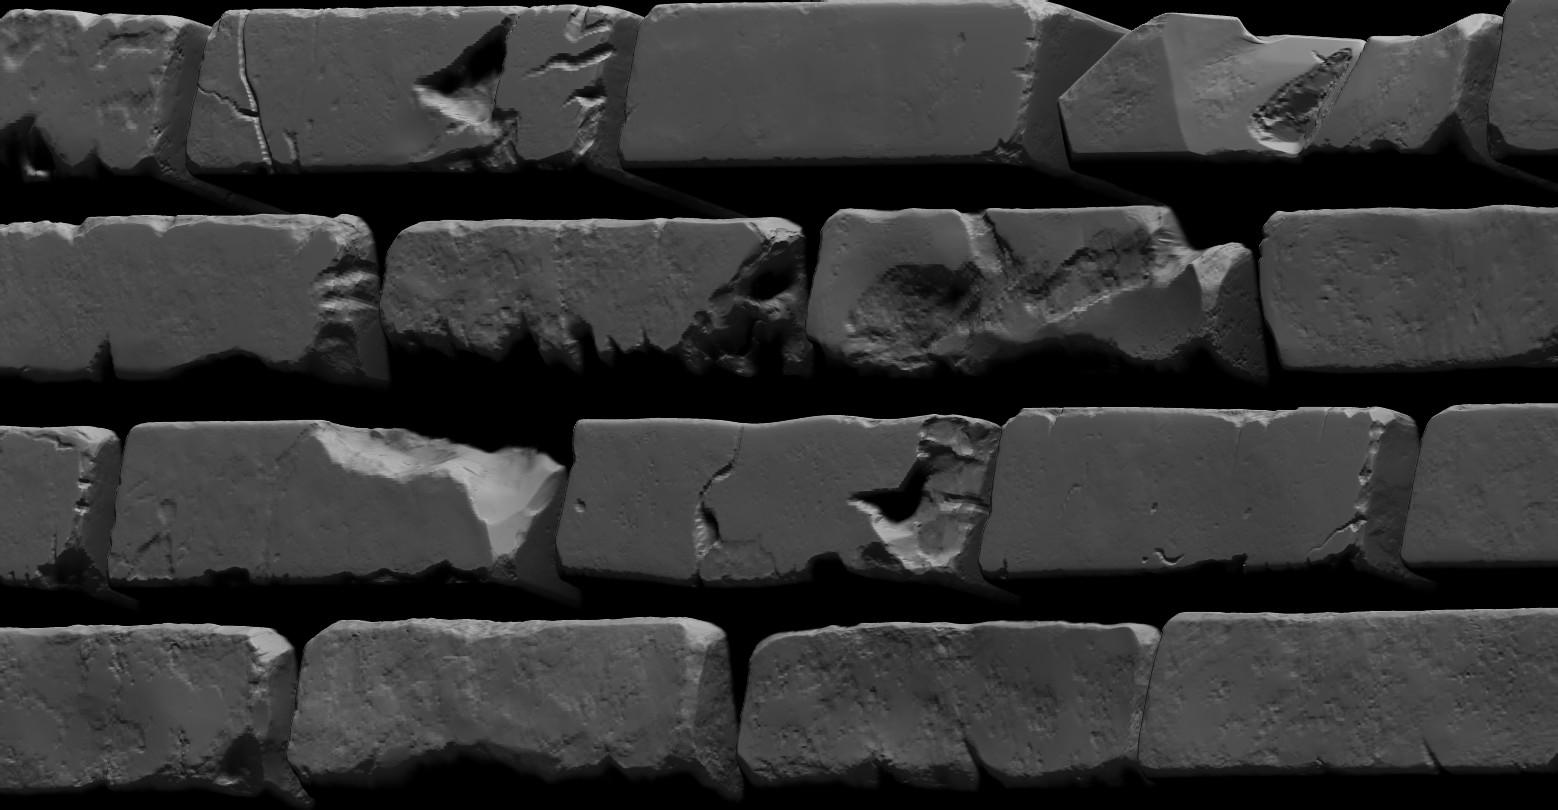 Bela csampai brick wall 01 render zb 05